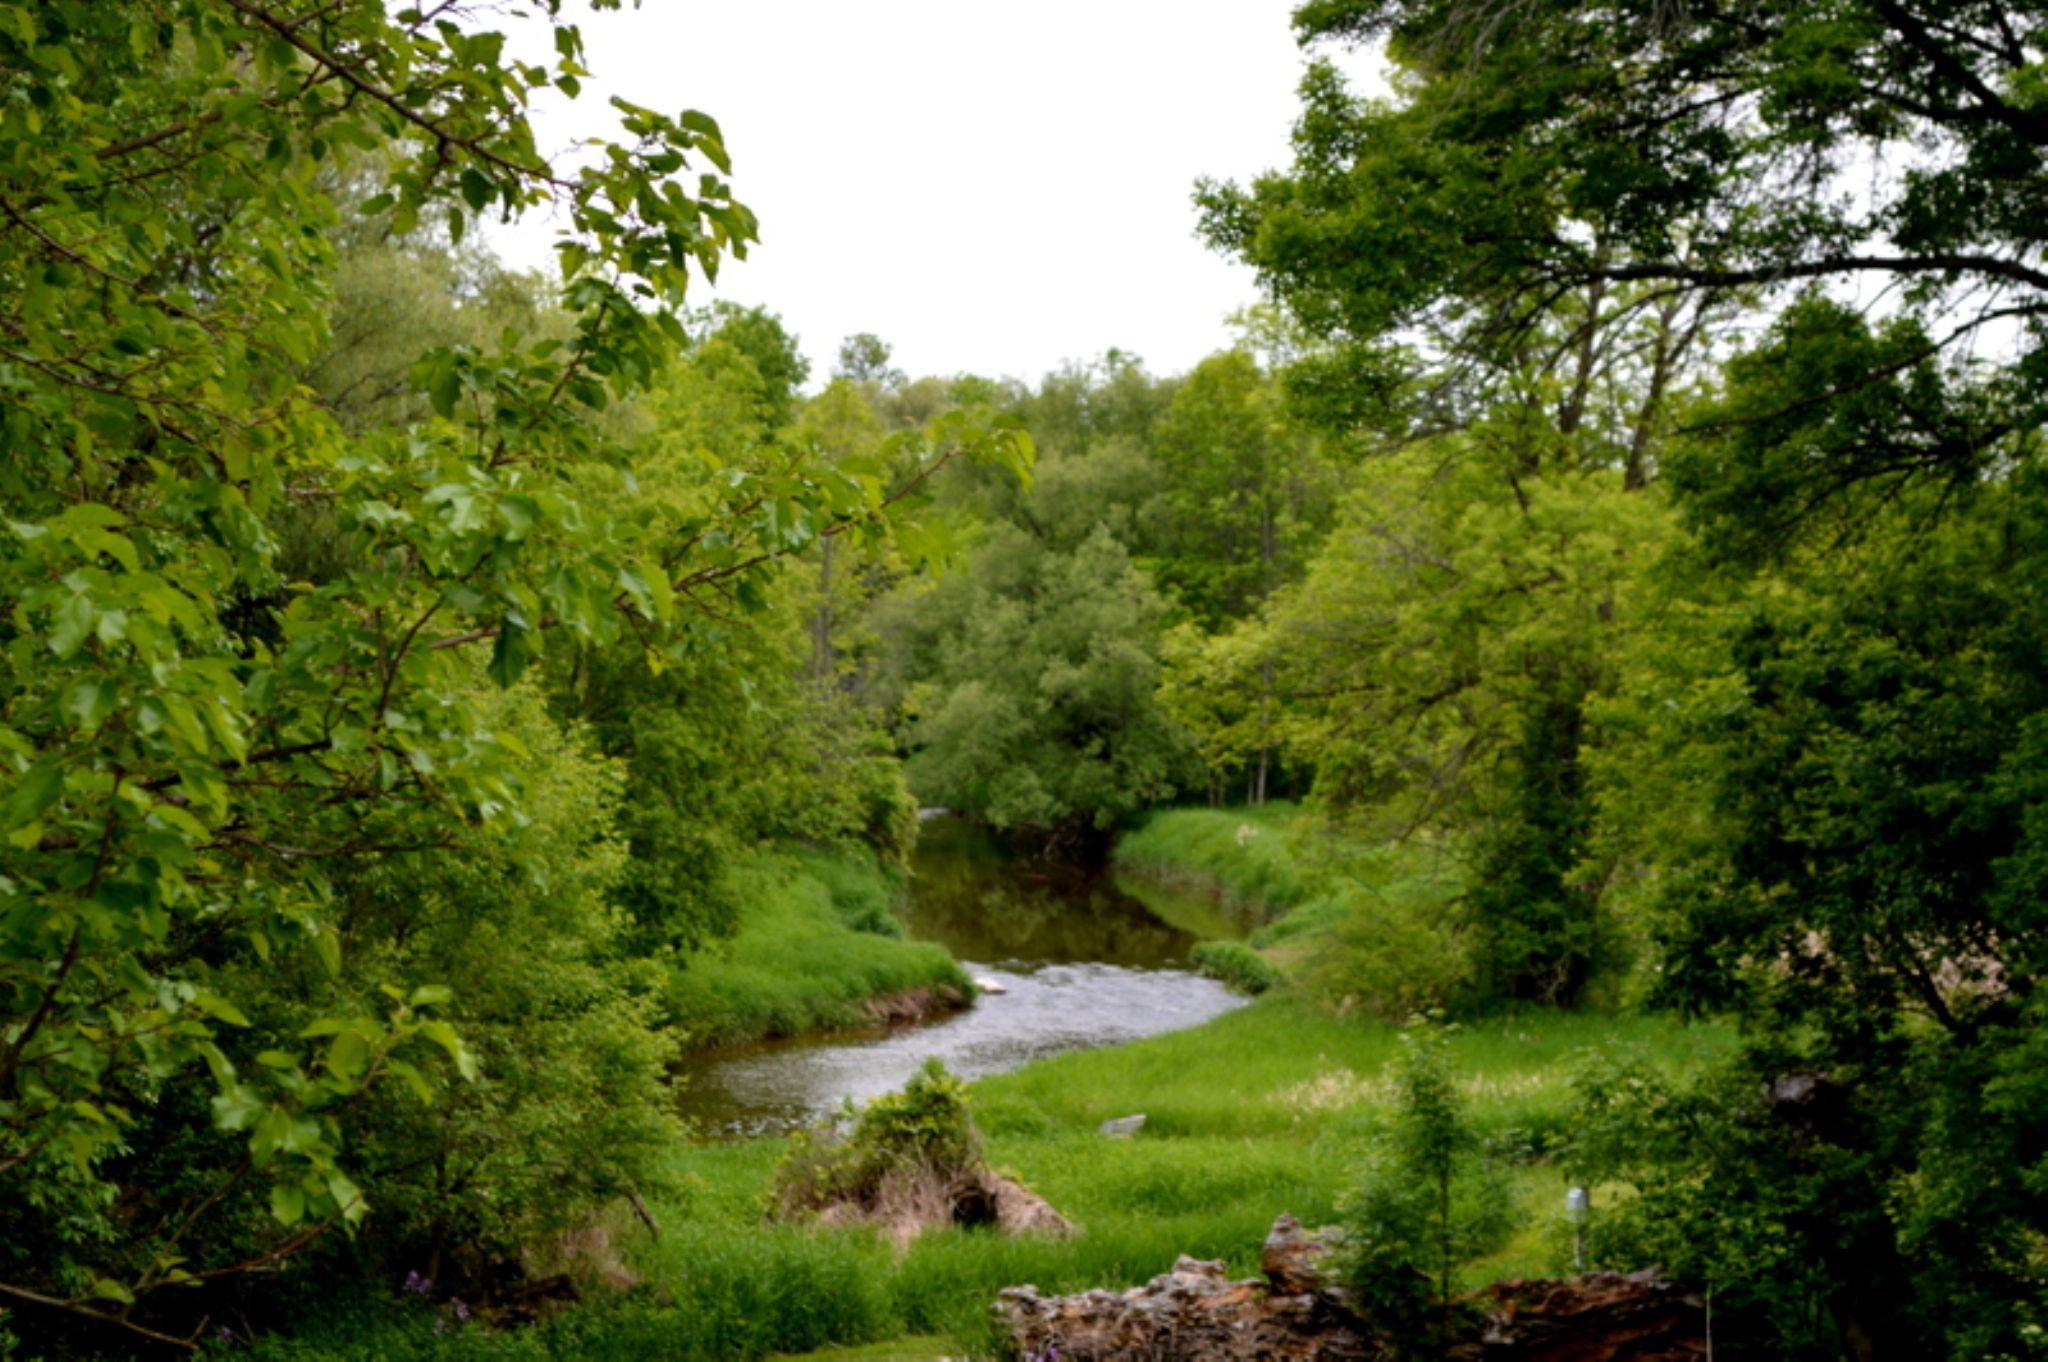 Maywood Park Sheboygan Wisconsin by Karen Mayer